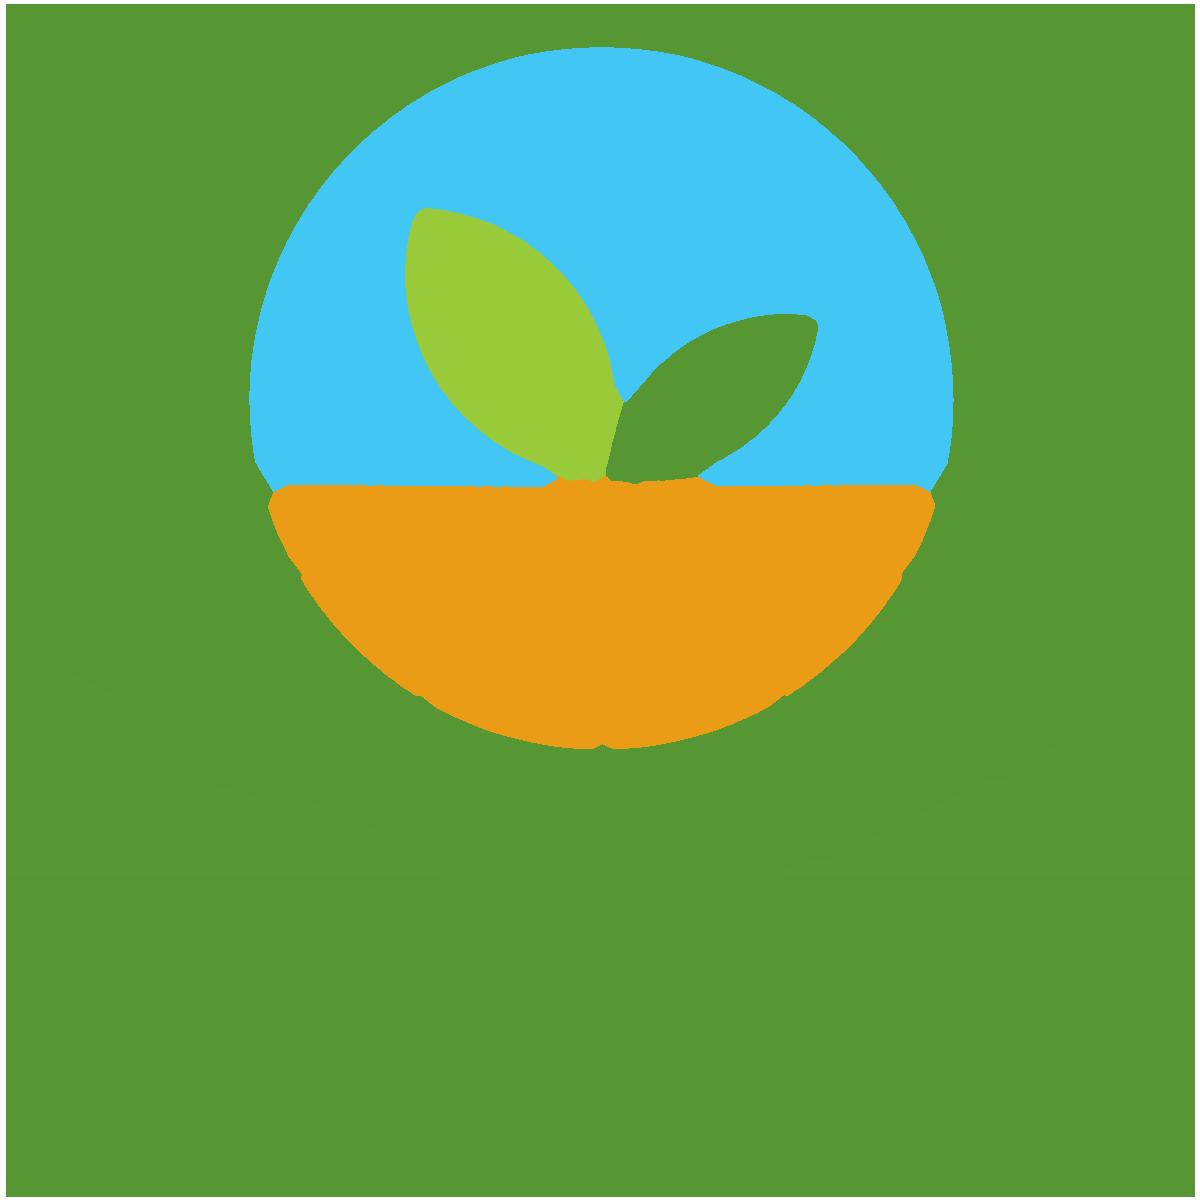 logo-site-e-commerce